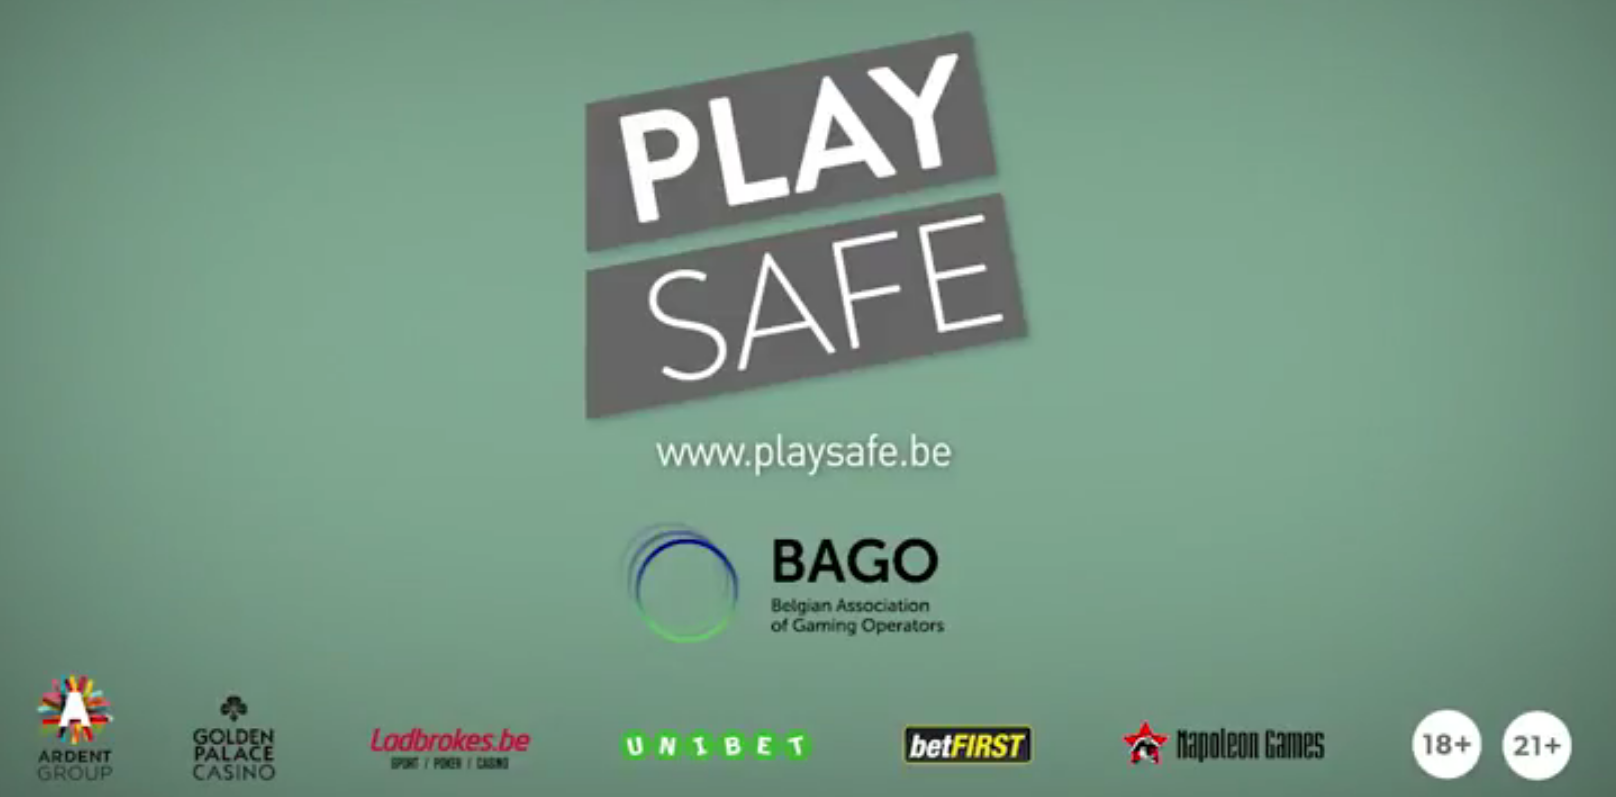 Playsafe - campaign